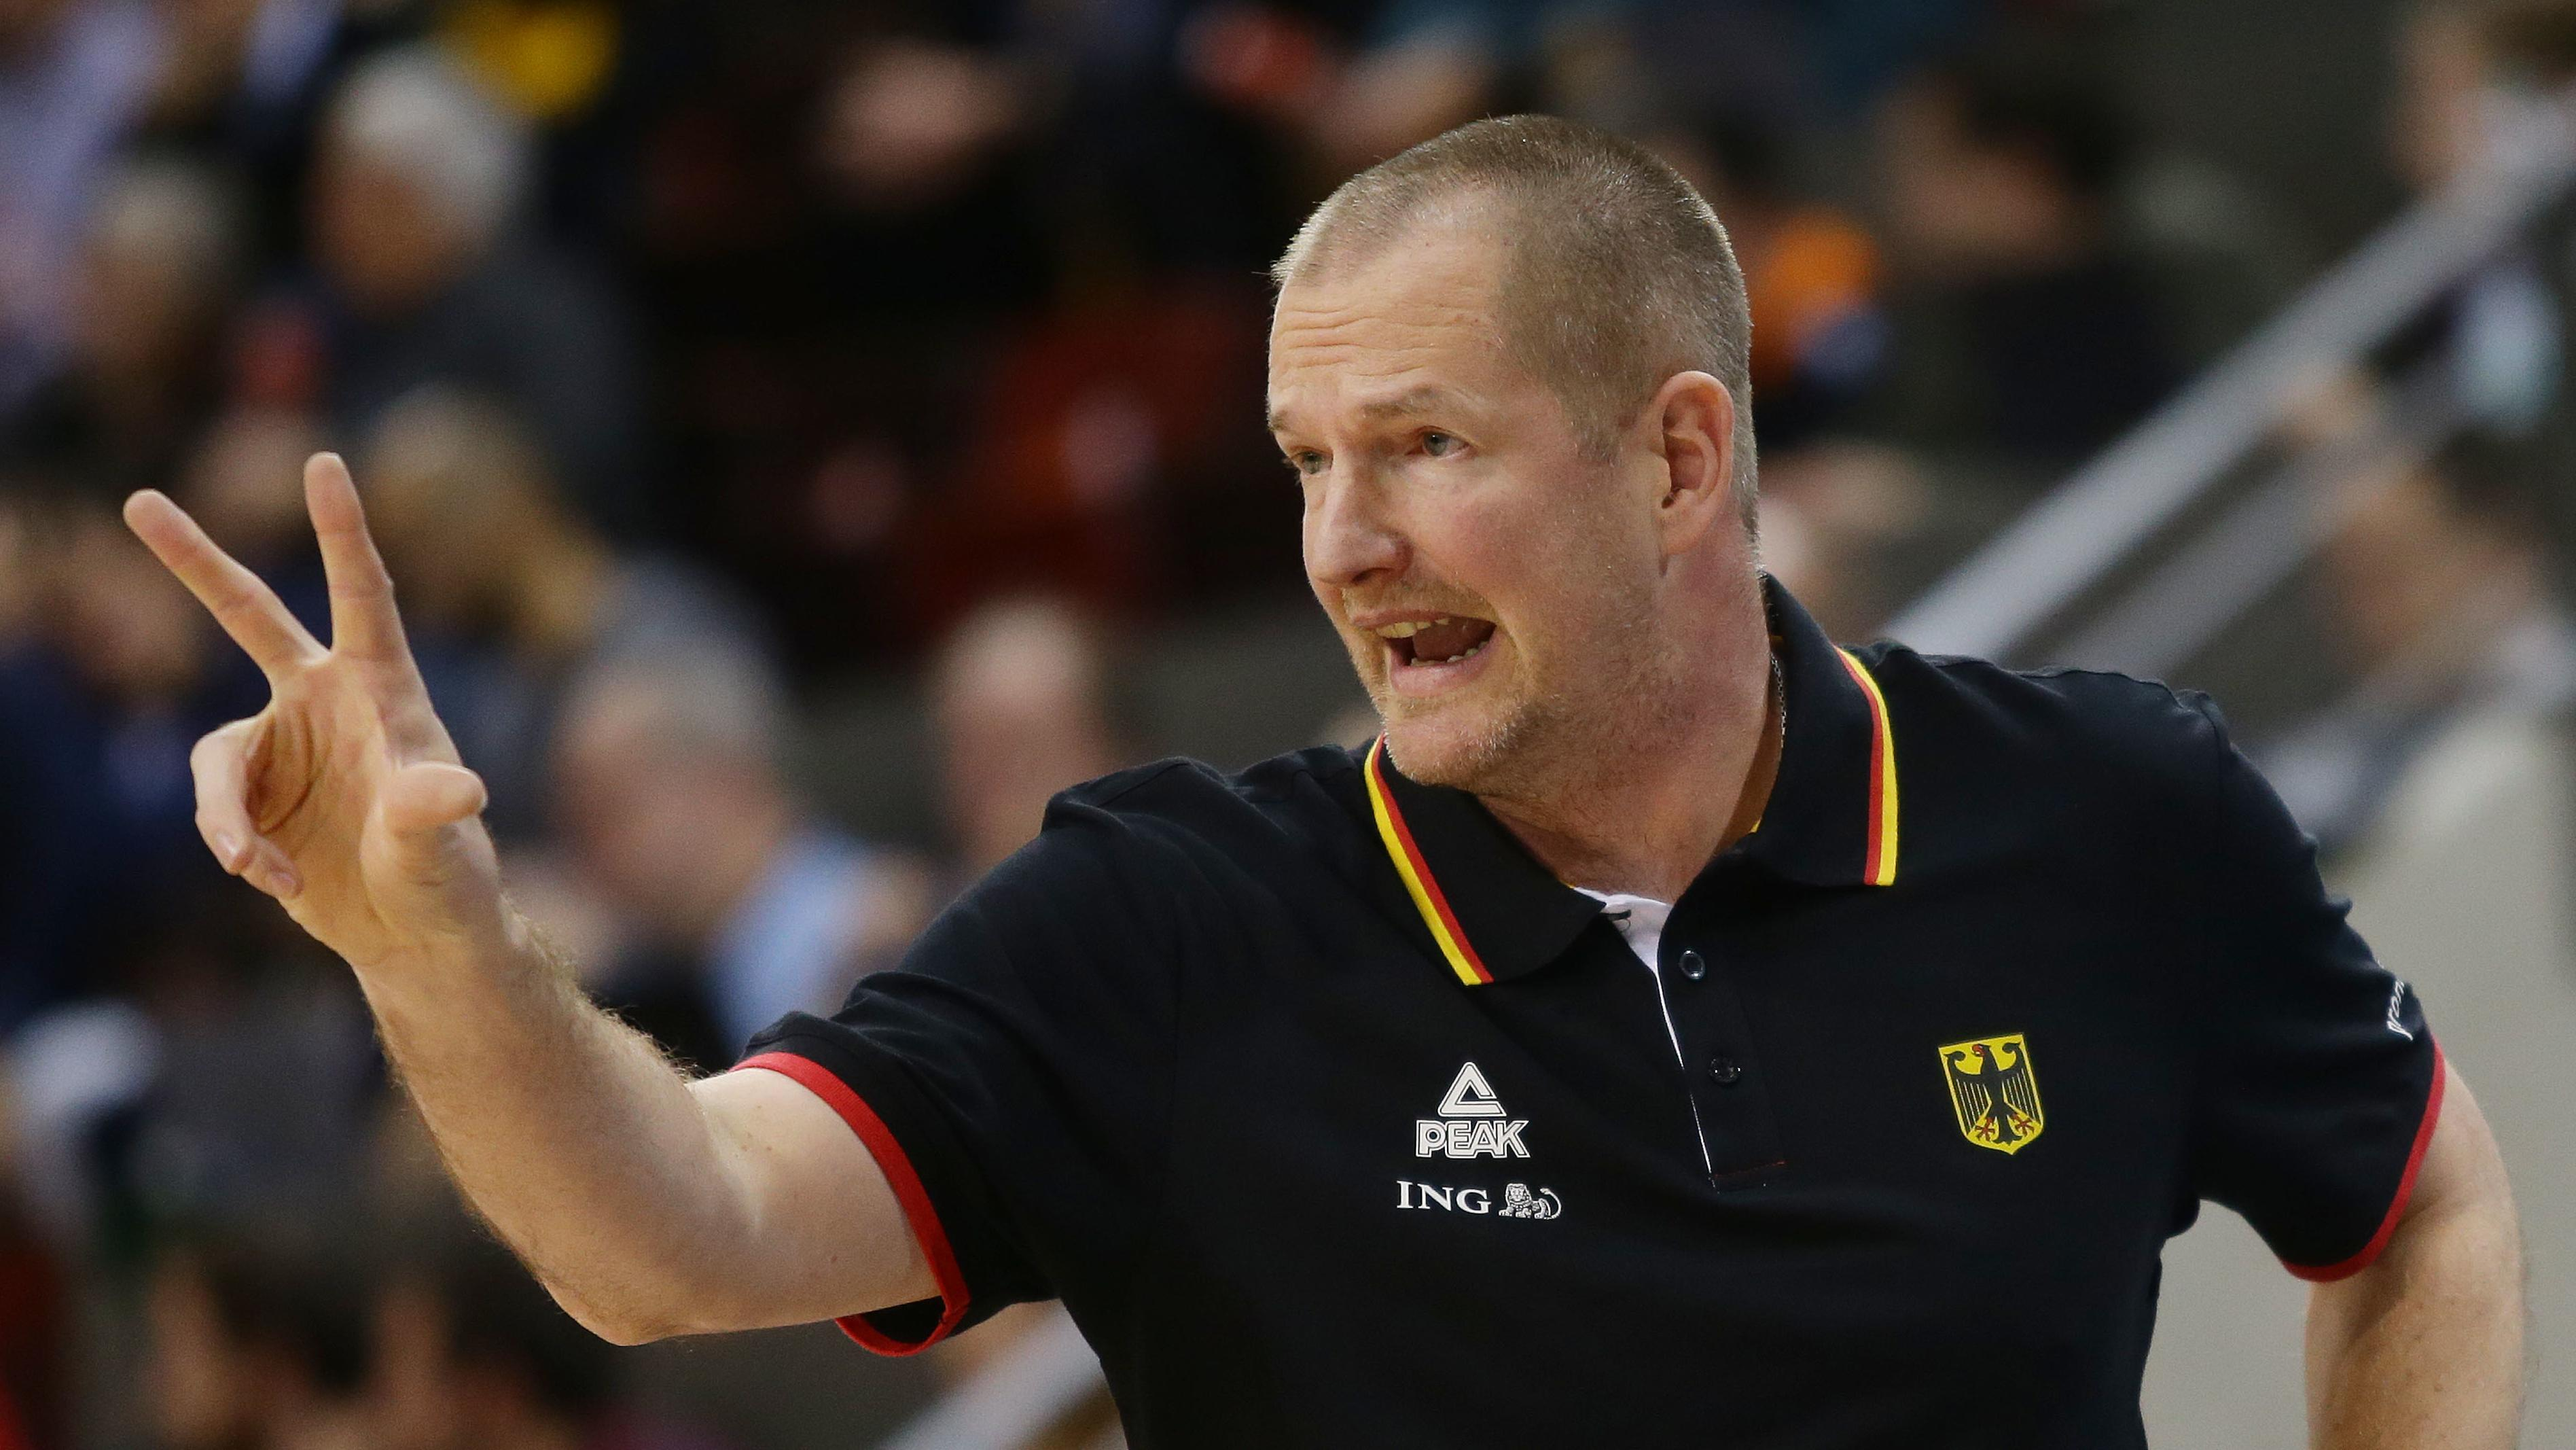 Bundestrainer Henrik Rödl